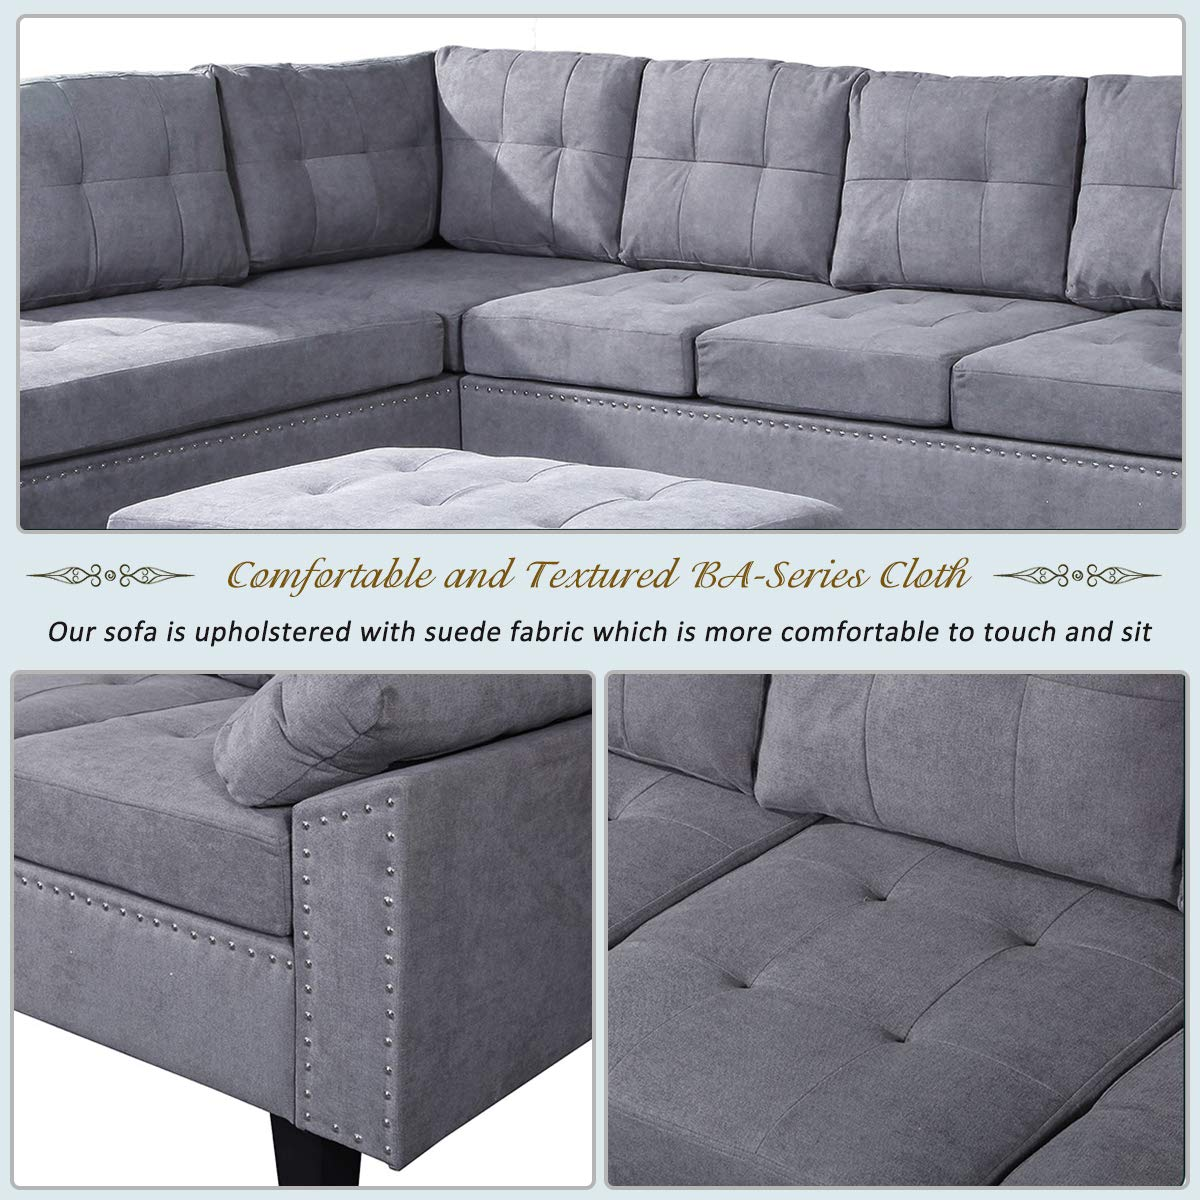 Amazon.com: Sofá modular con chaise longue y otomana ...